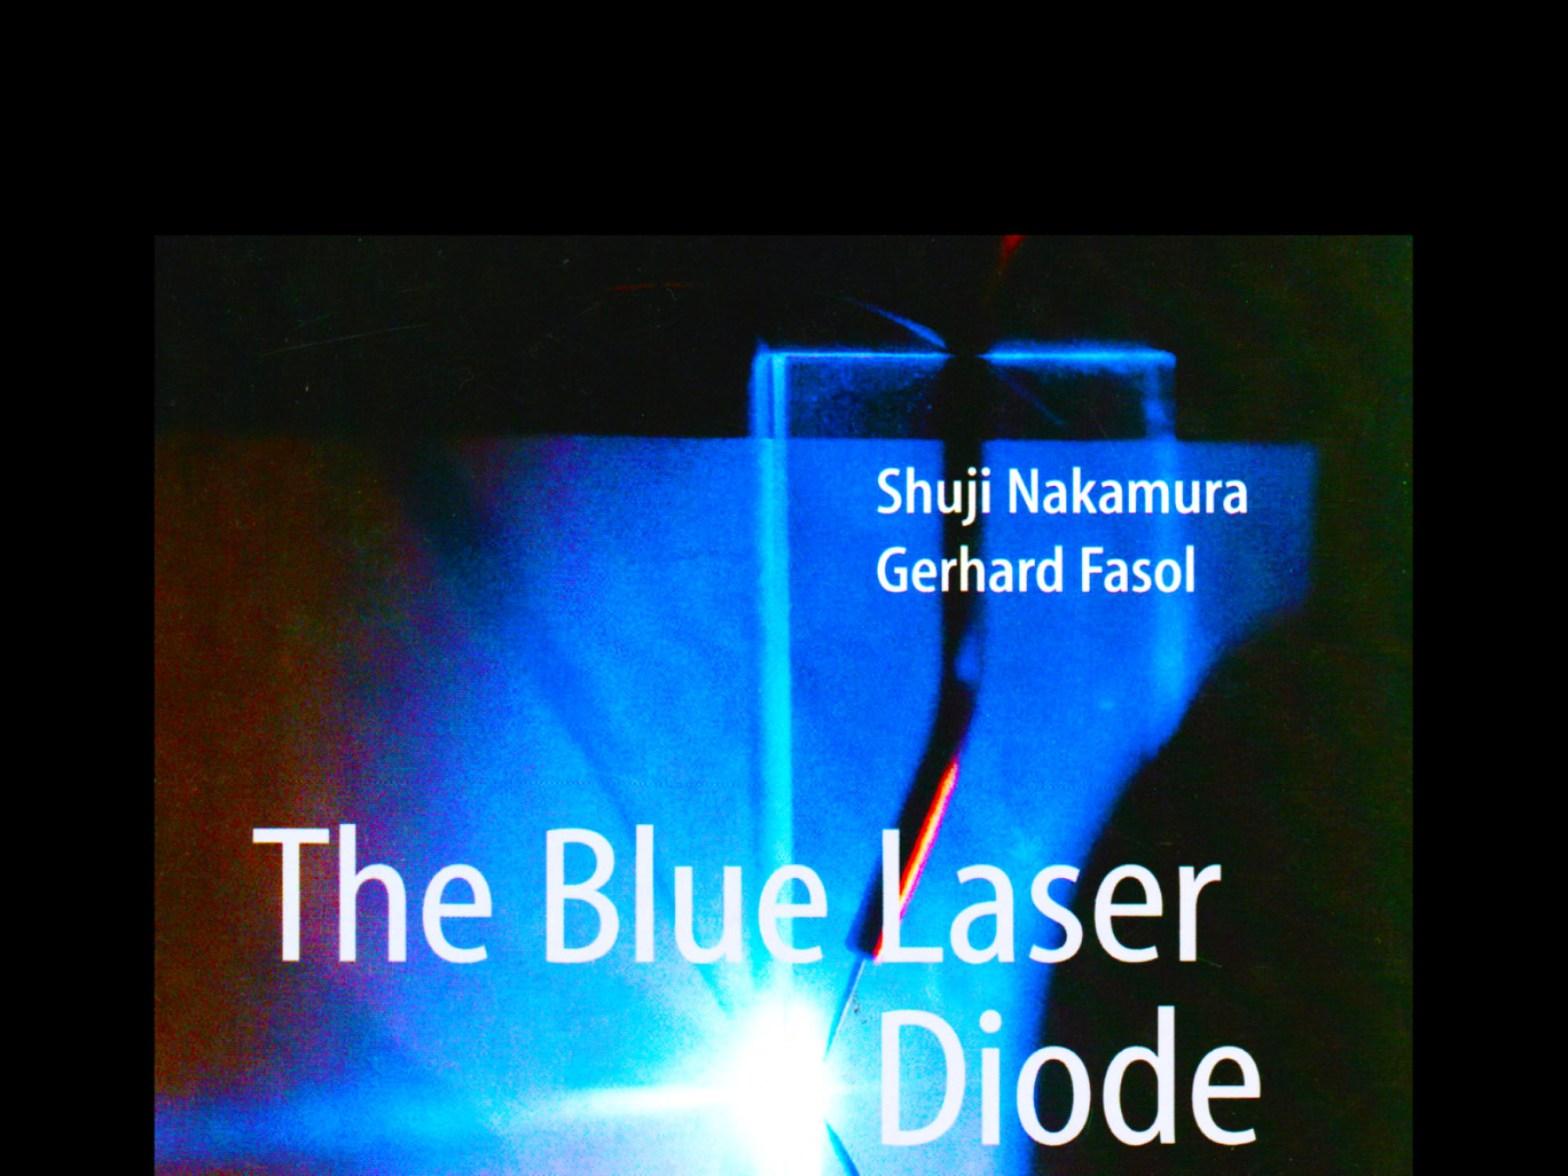 Shuji Nakamura & Gerhard Fasol the blue laser diode